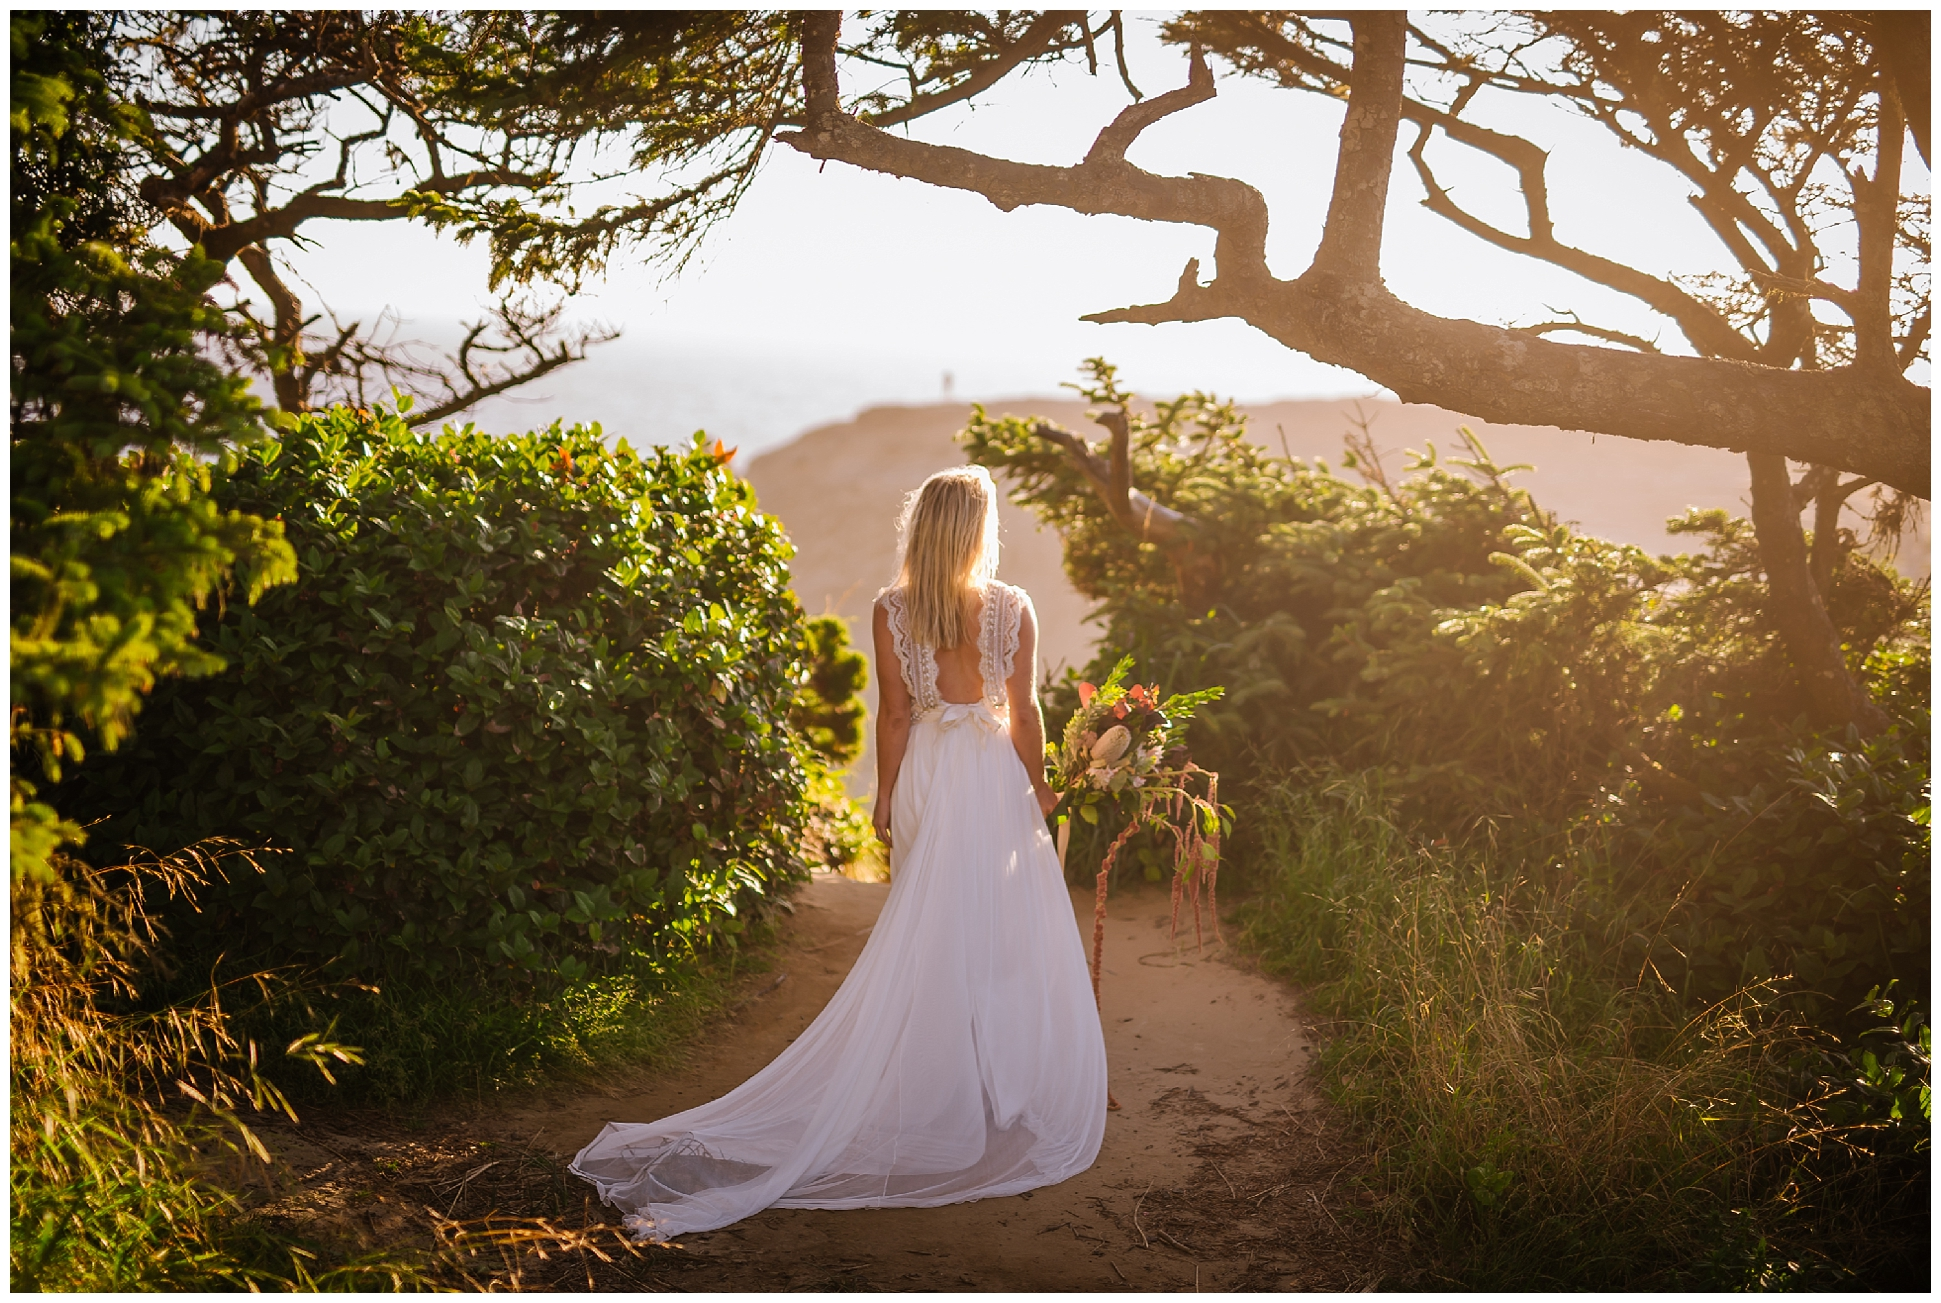 Cape-kiwanda-bridal-portrait-destination-wedding-photographer_0025.jpg